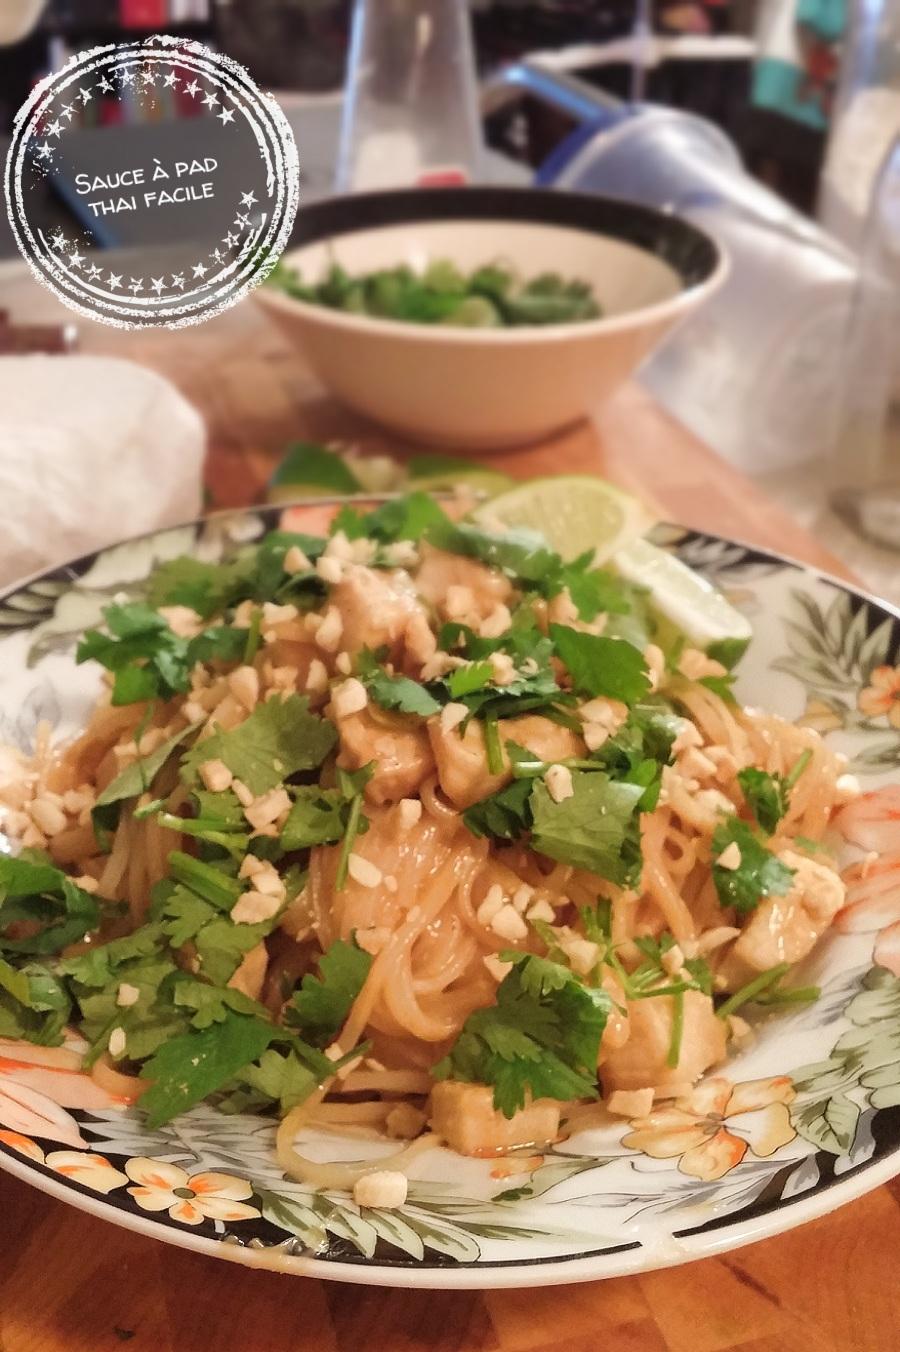 Sauce à pad thai facile - Auboutdelalangue.com